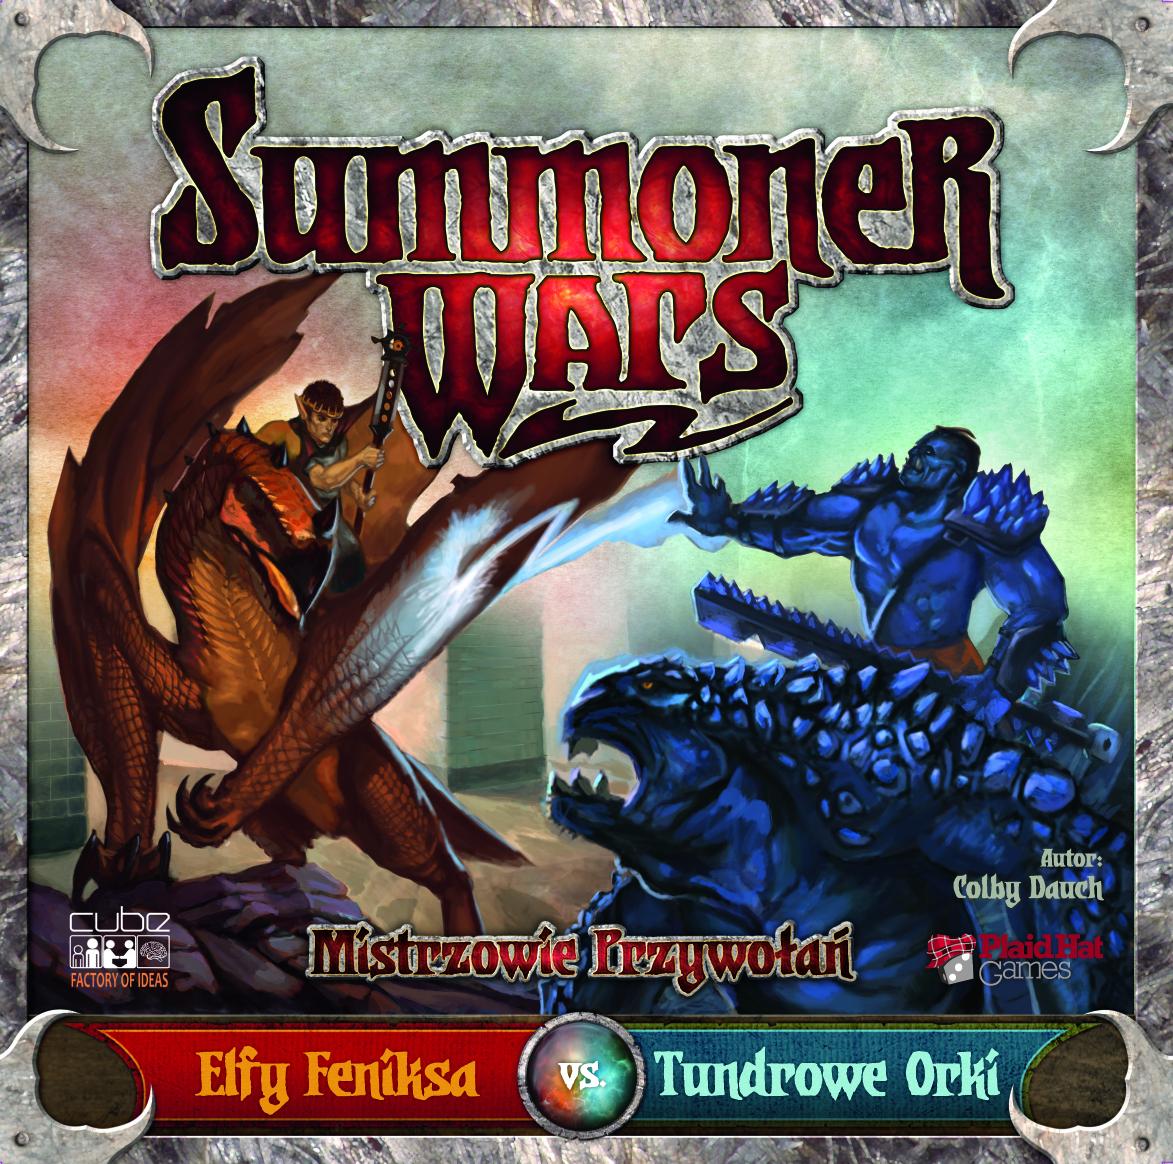 Summoner Wars: Elfy Feniksa vs Tundrowe Orki